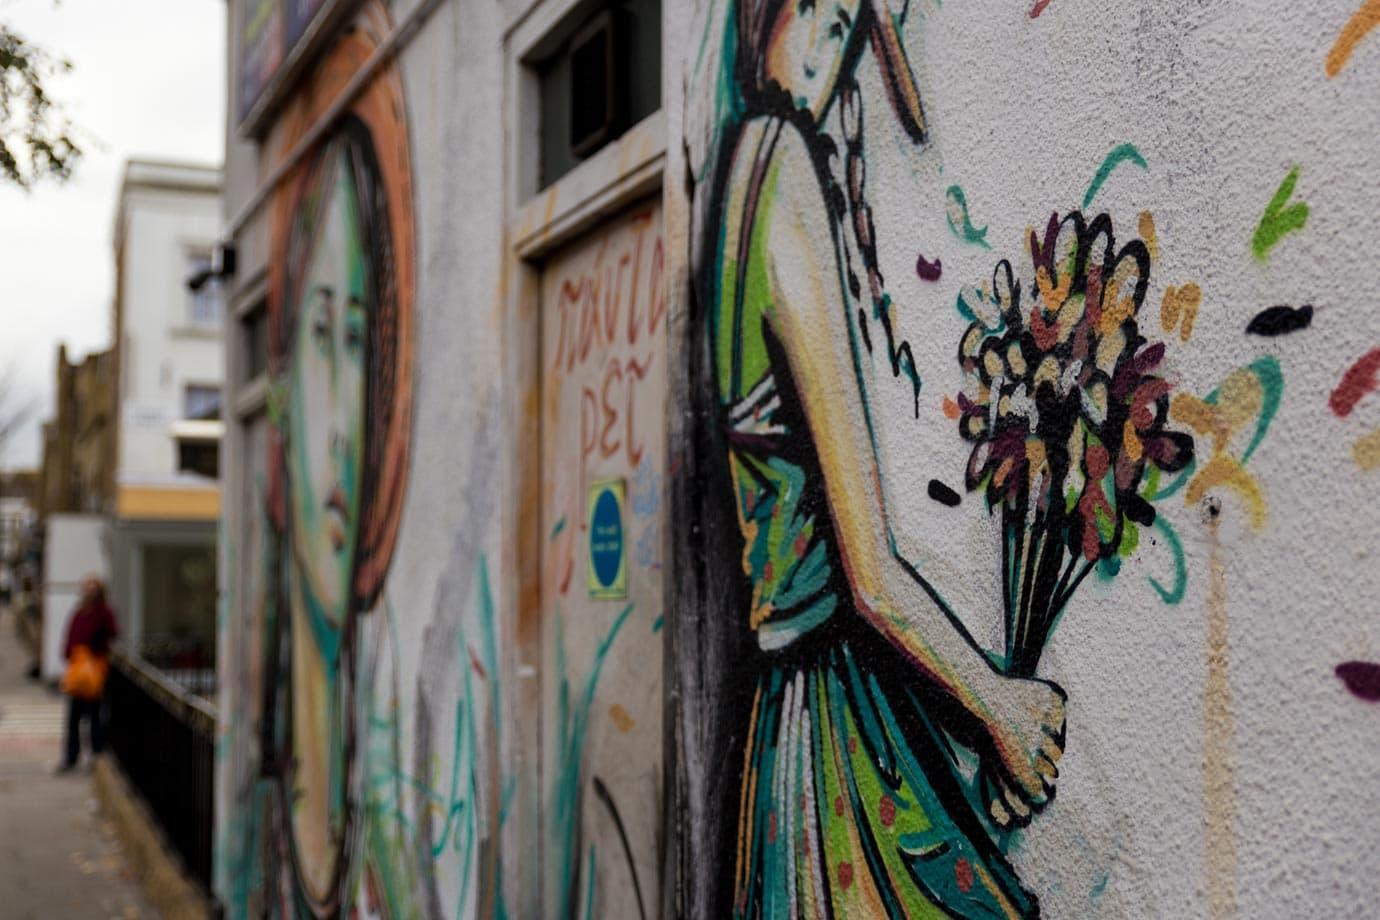 street art camden alice london